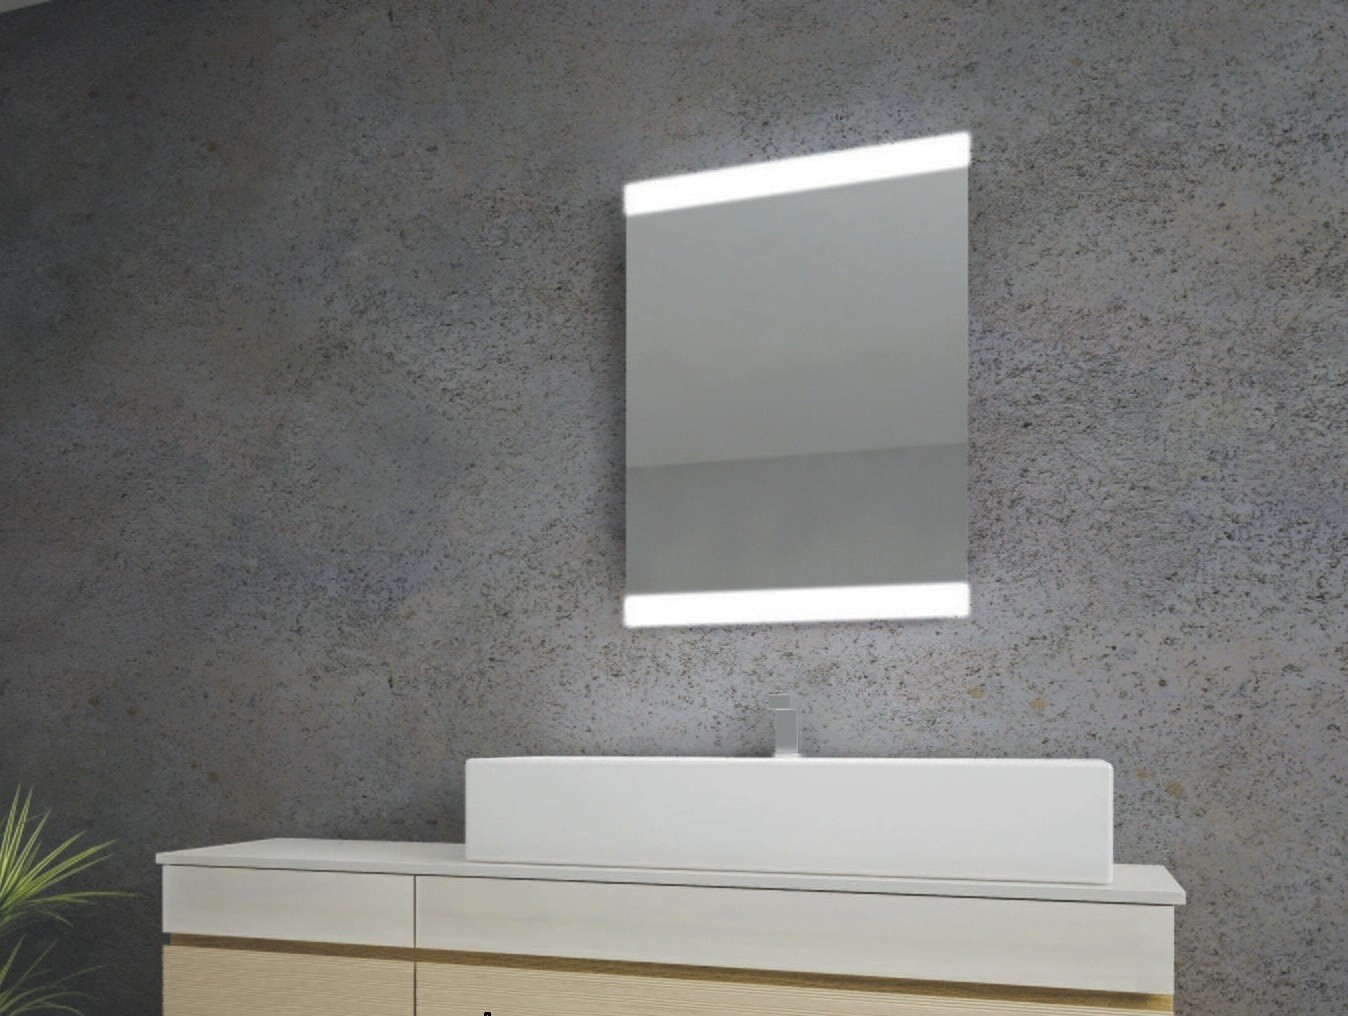 Miroir de salle de bains LED RBA série Mono 50 x 70 cm